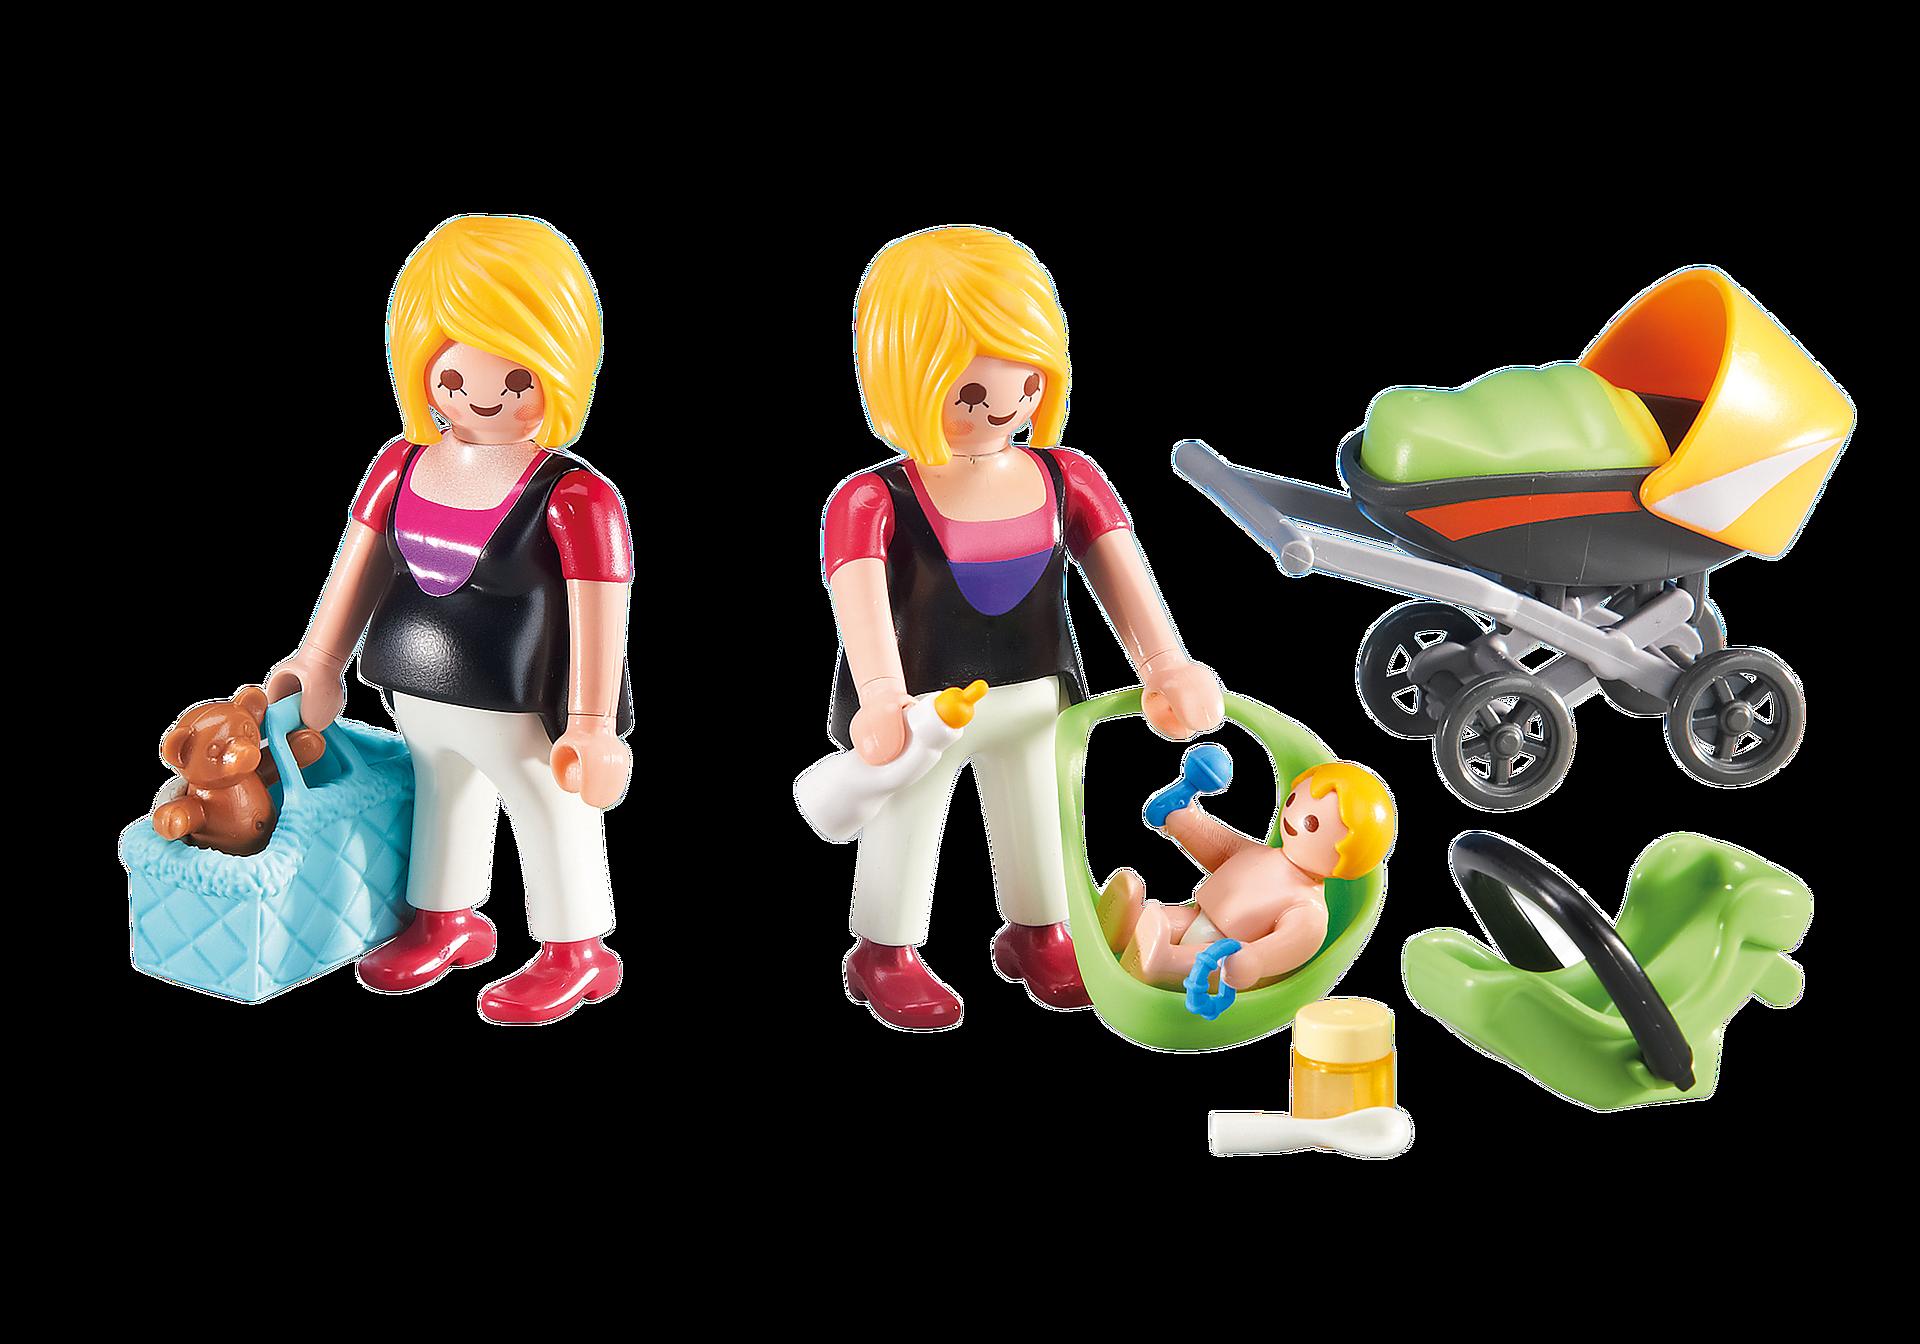 http://media.playmobil.com/i/playmobil/6447_product_detail/Femme enceinte avec maman et bébé